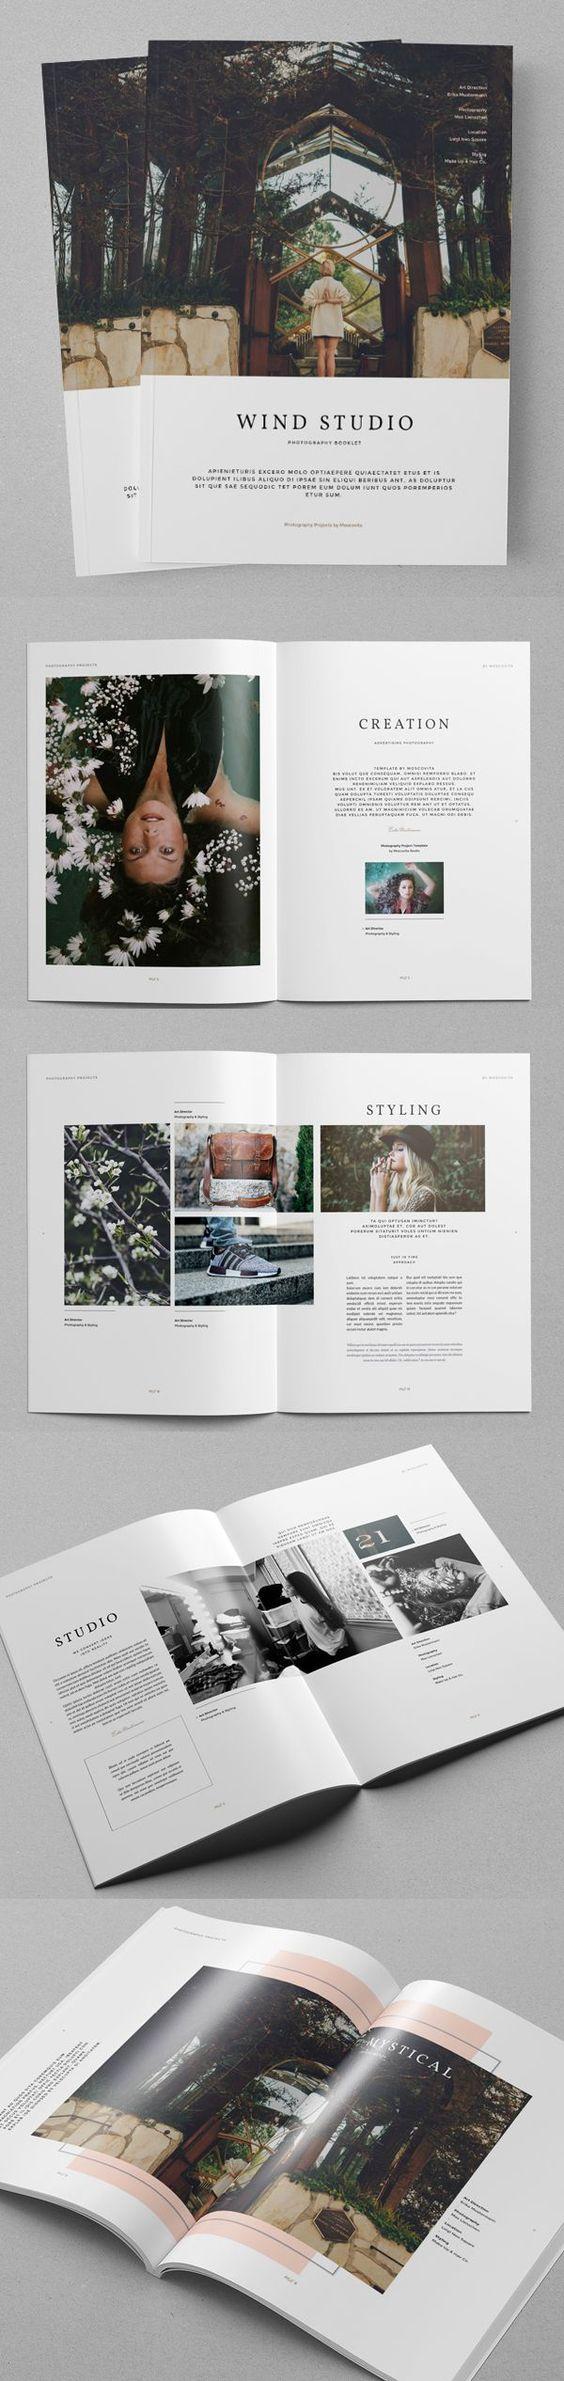 imagenes folletos 1